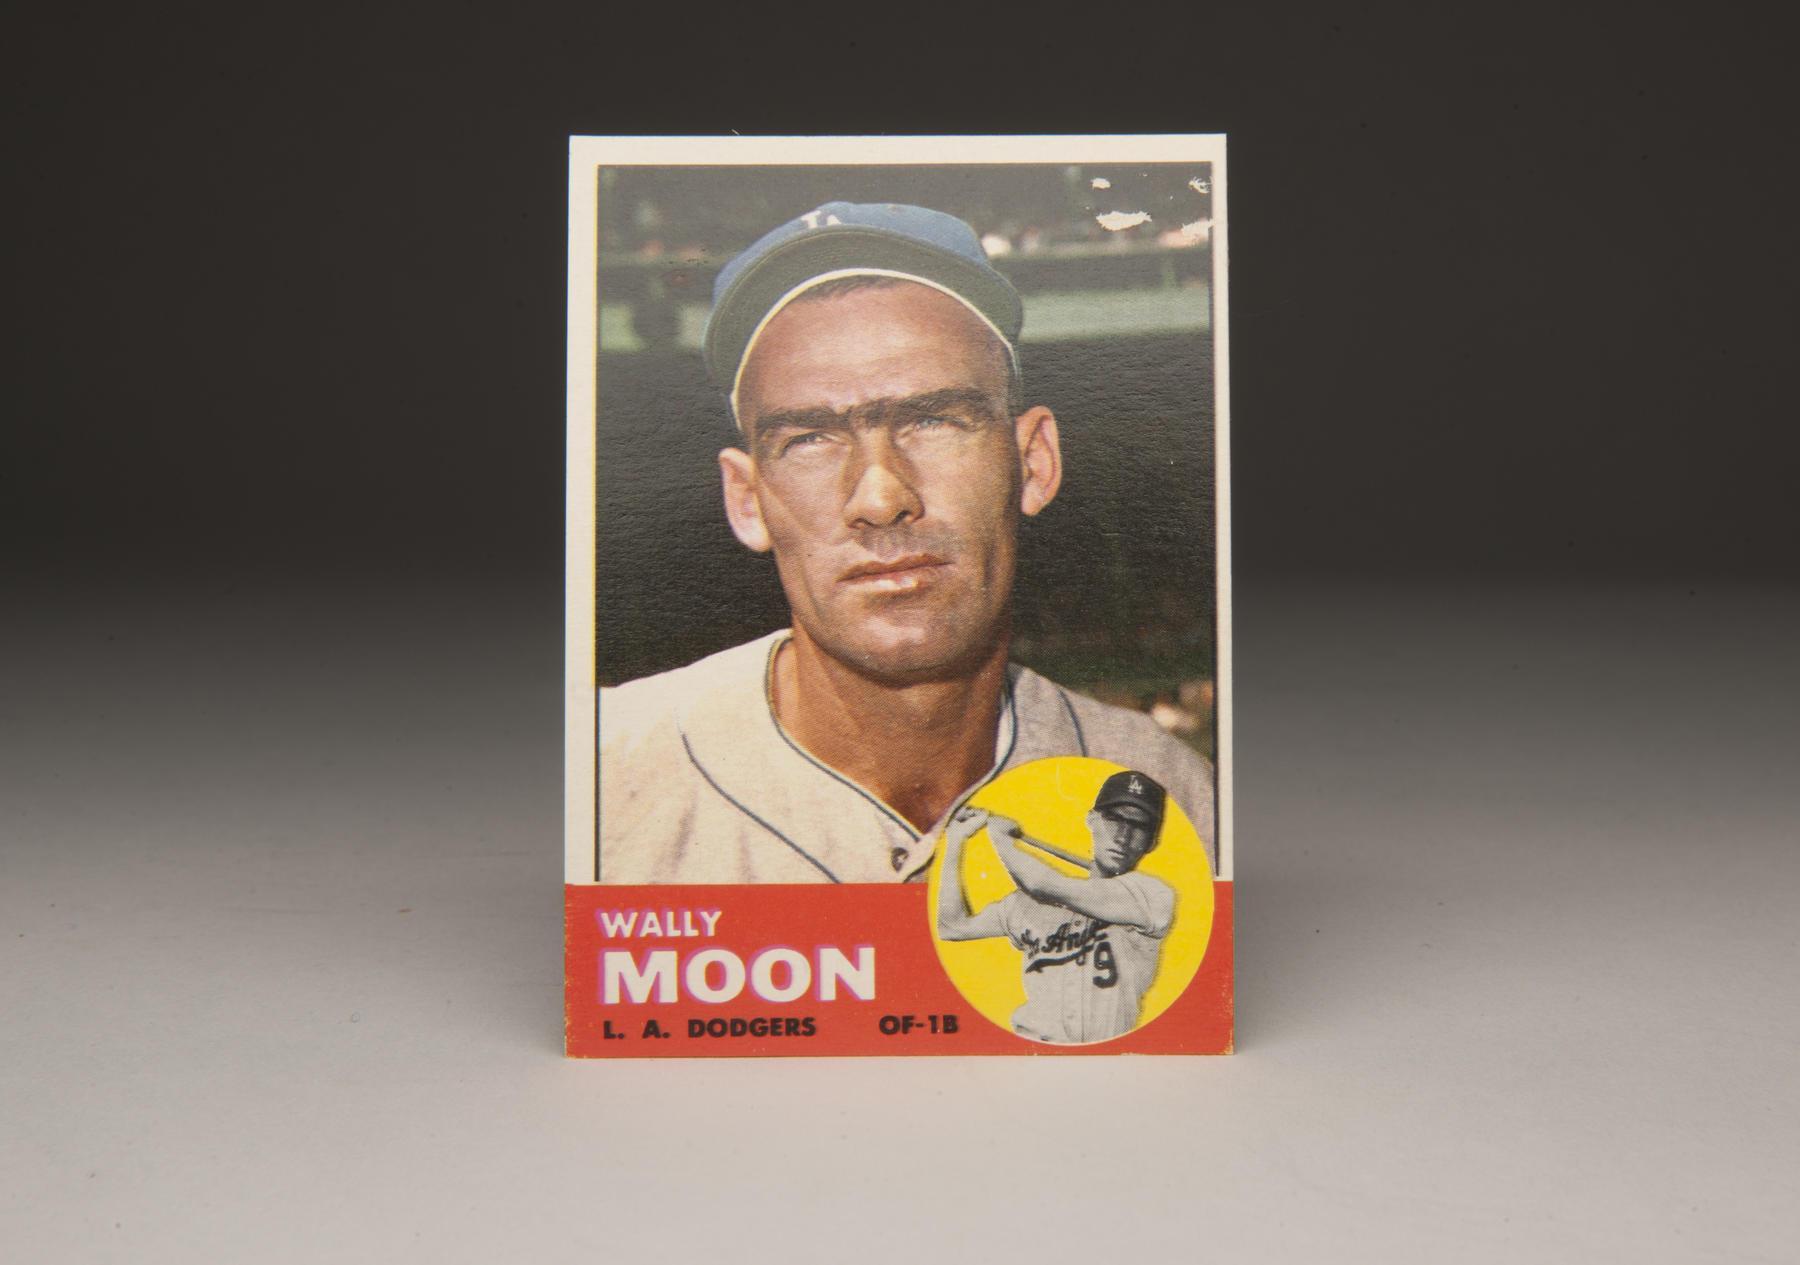 1963 Wally Moon Topps card. (Milo Stewart, Jr. / National Baseball Hall of Fame)